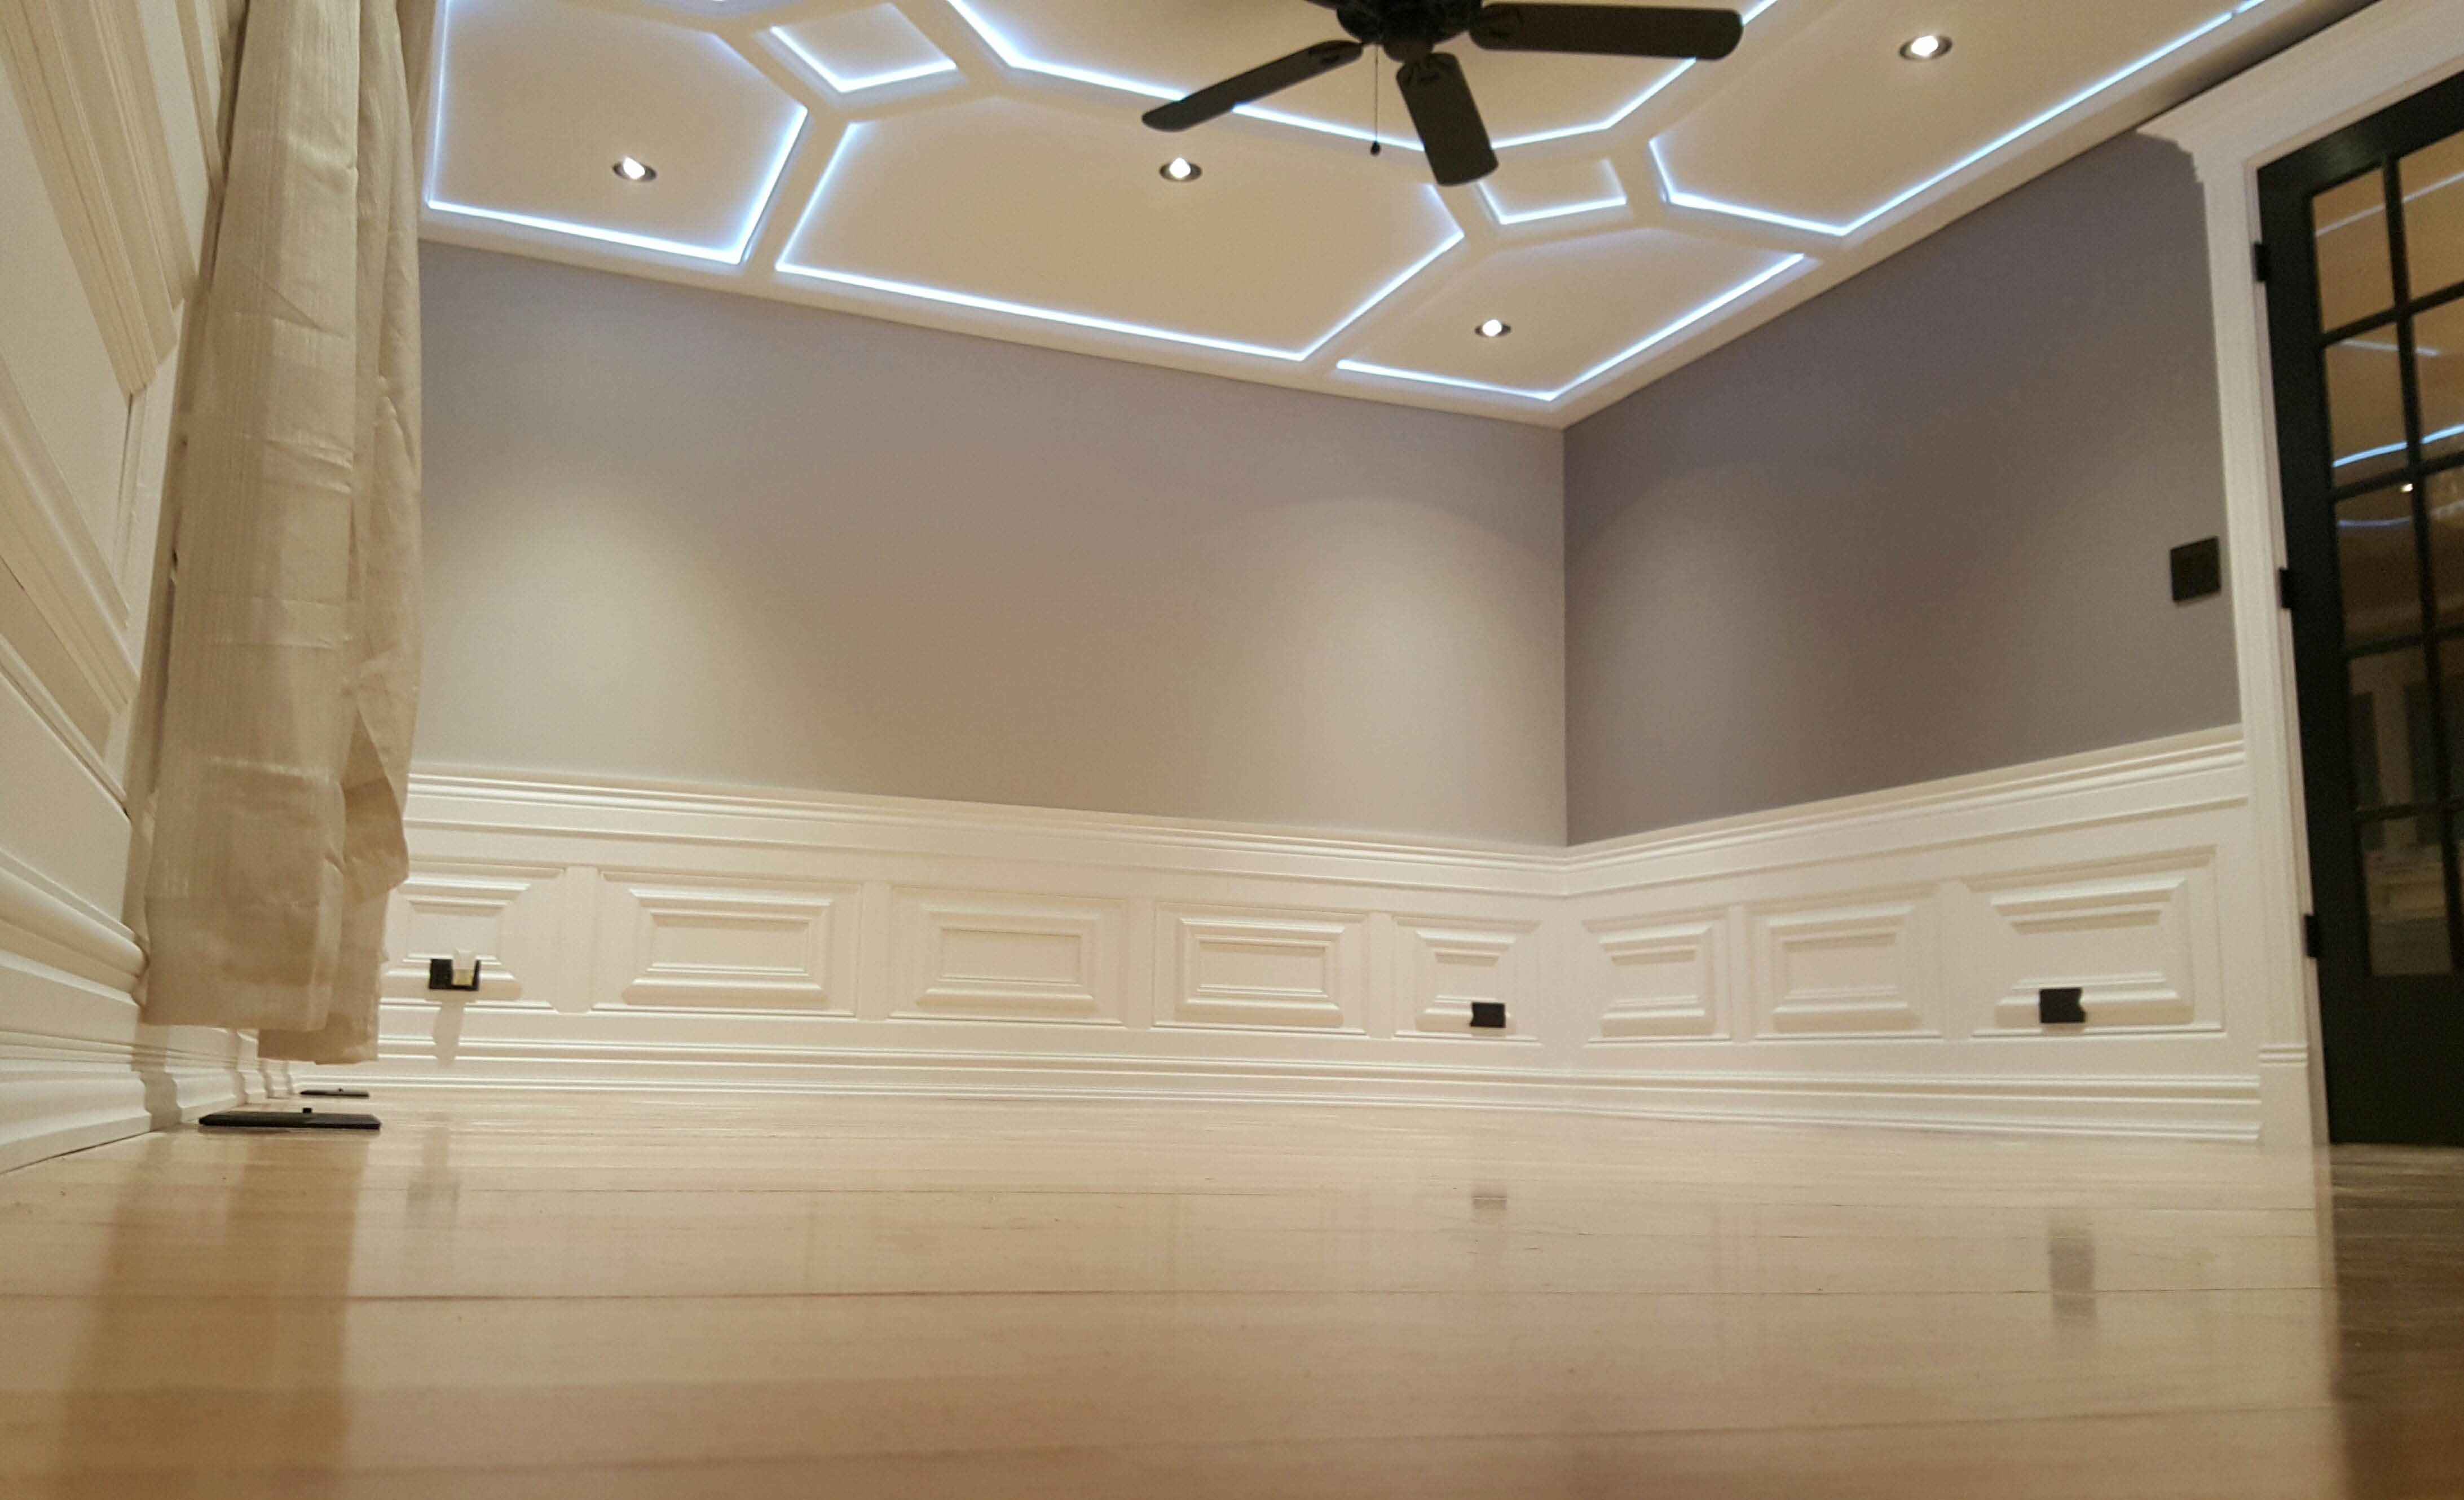 Interior lighting, home improvement near Arlington Heights, Palatine